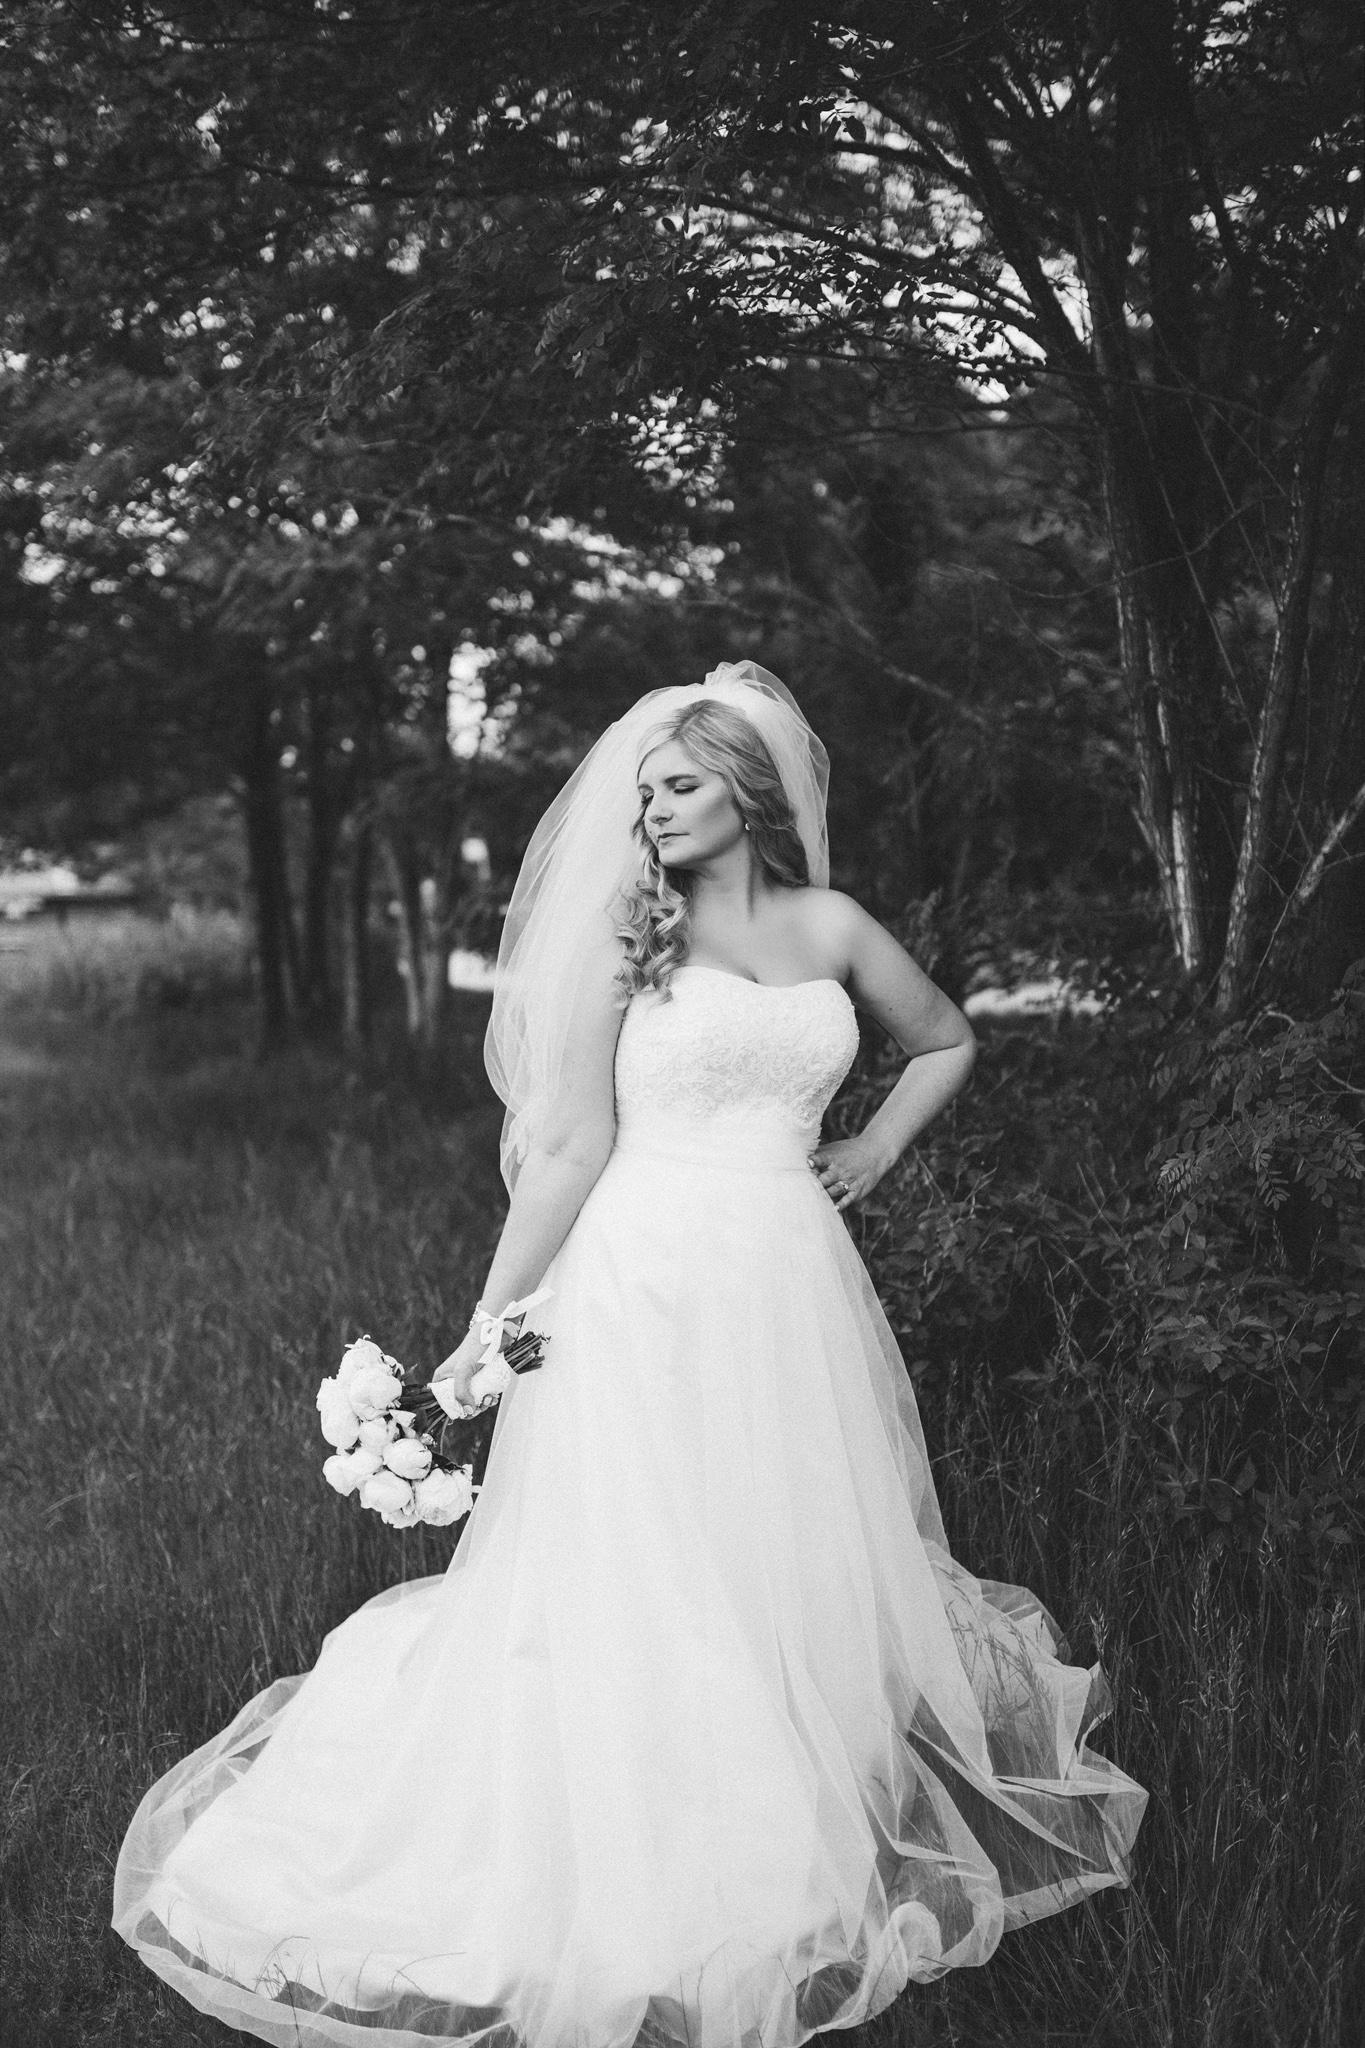 IMG_4990-VANCOUVER-WEDDING-PHOTOGRAPHER-JENNIFER-PICARD-PHOTOGRAPHY-WEB.jpg